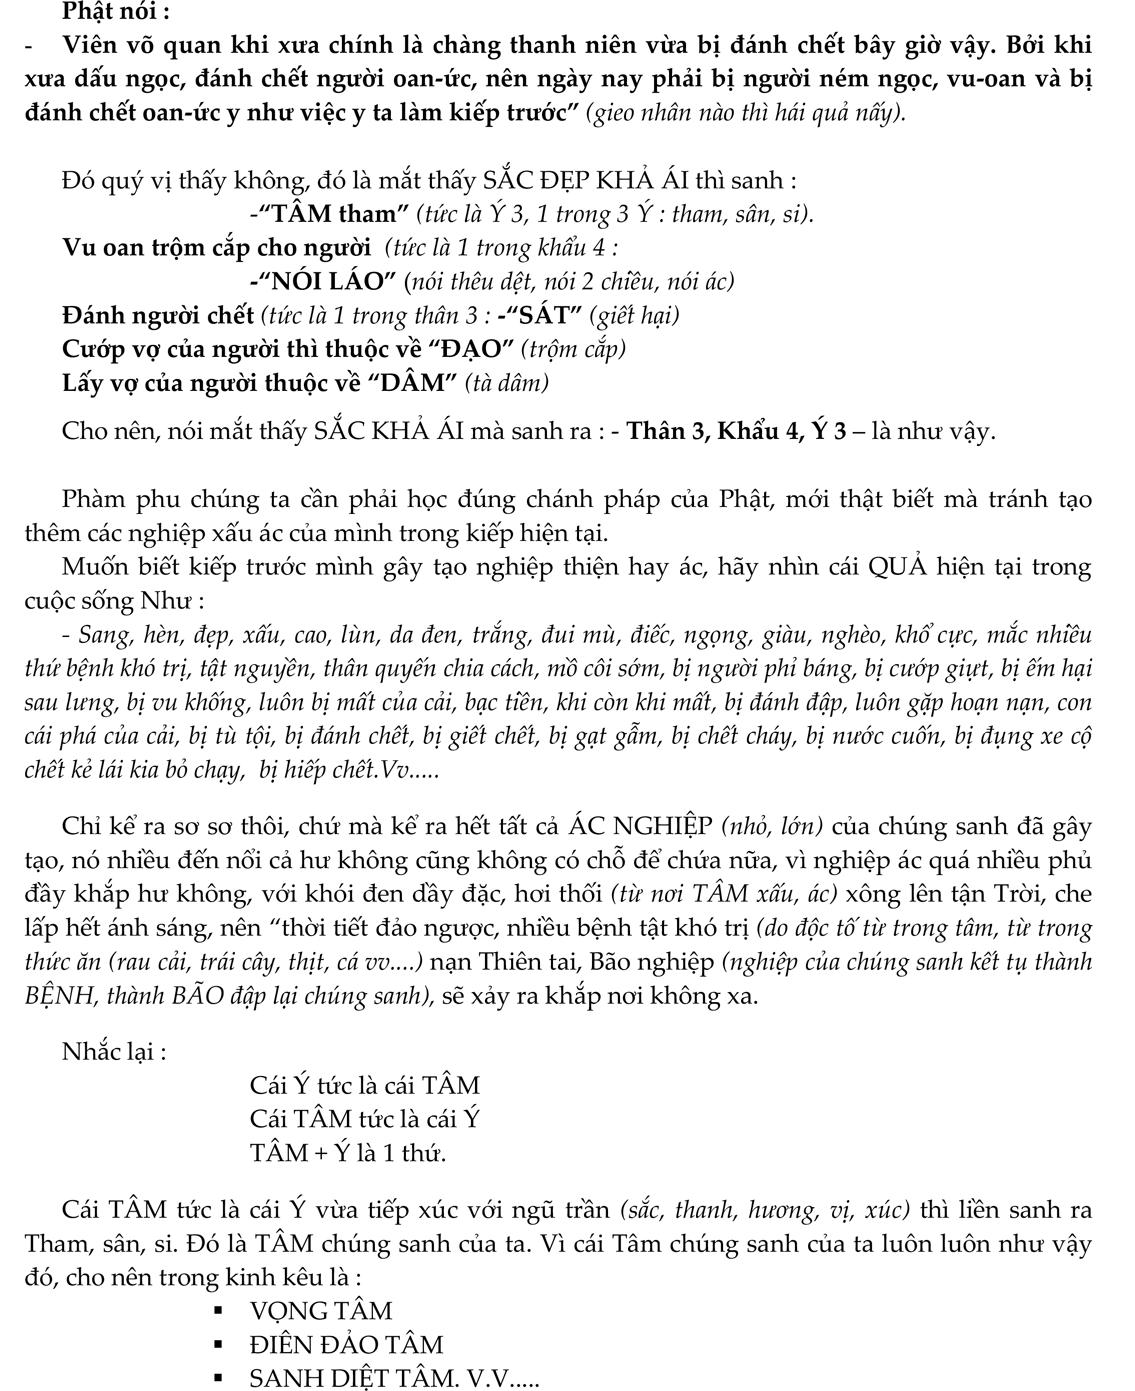 C:\Users\kimtl\Desktop\thu phat hoc hinh\90-12.png